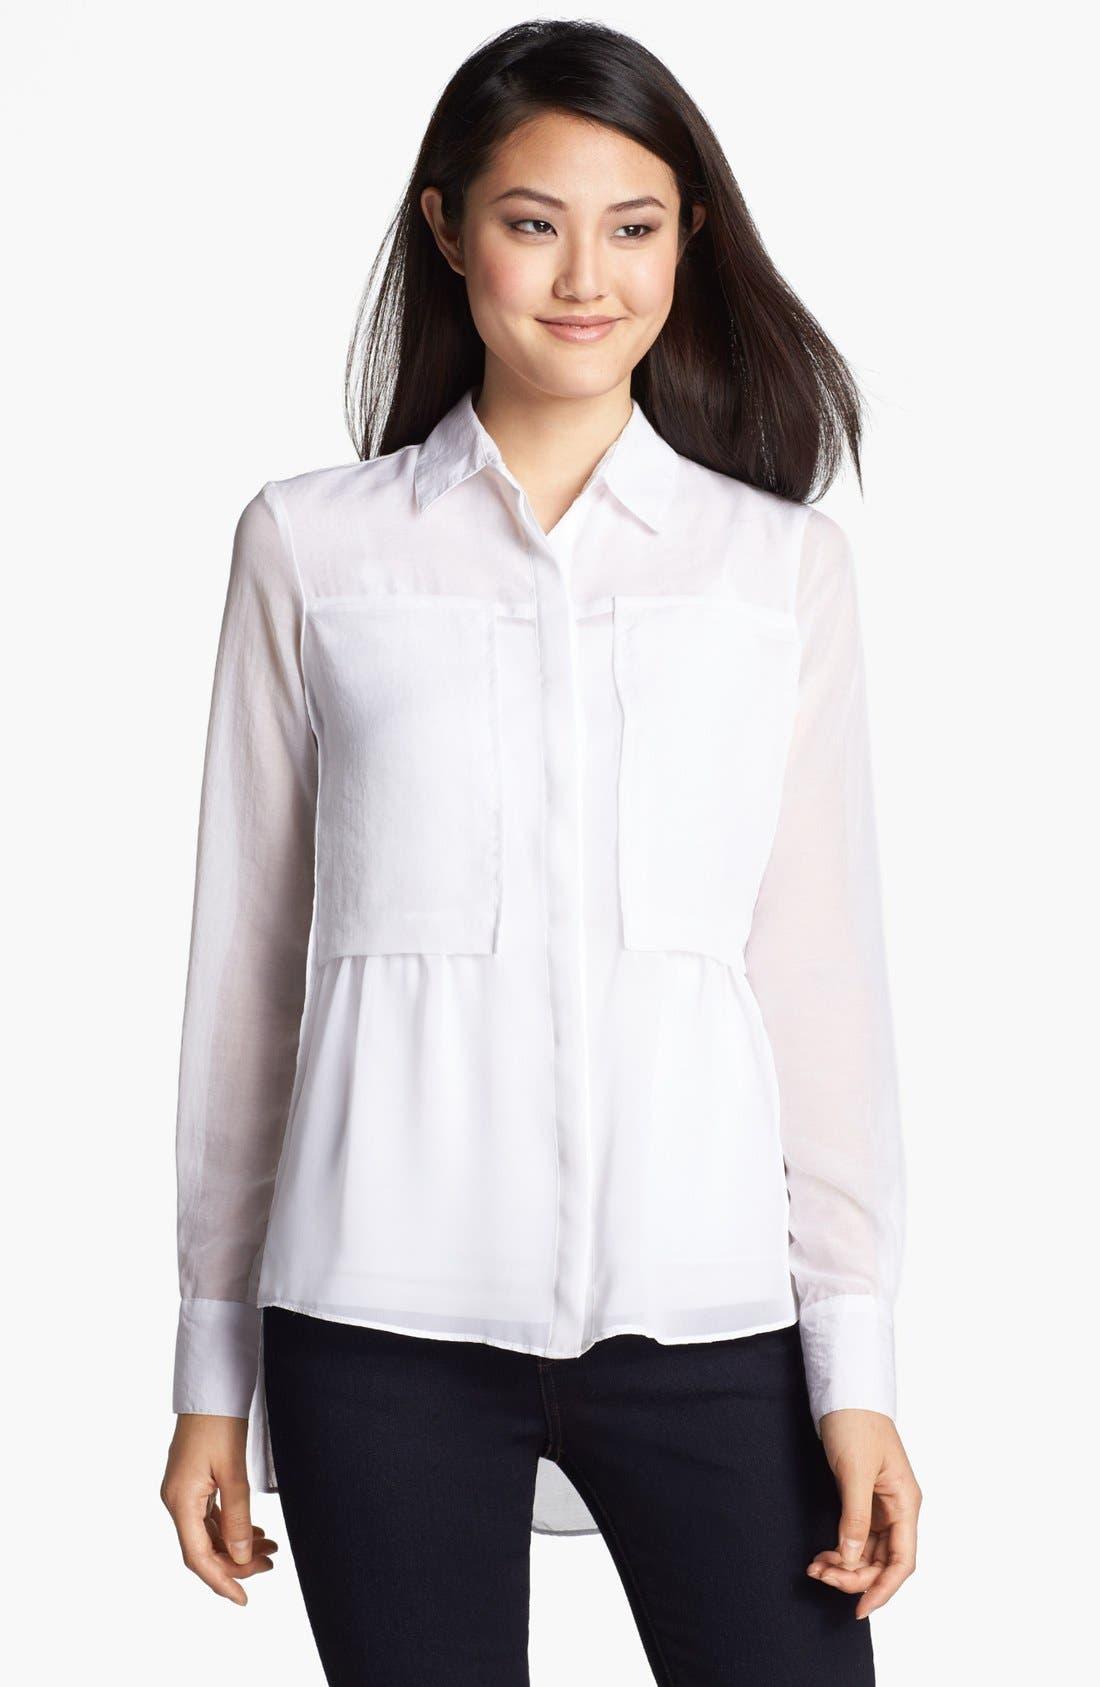 Main Image - Kenneth Cole New York 'Livana' Shirt